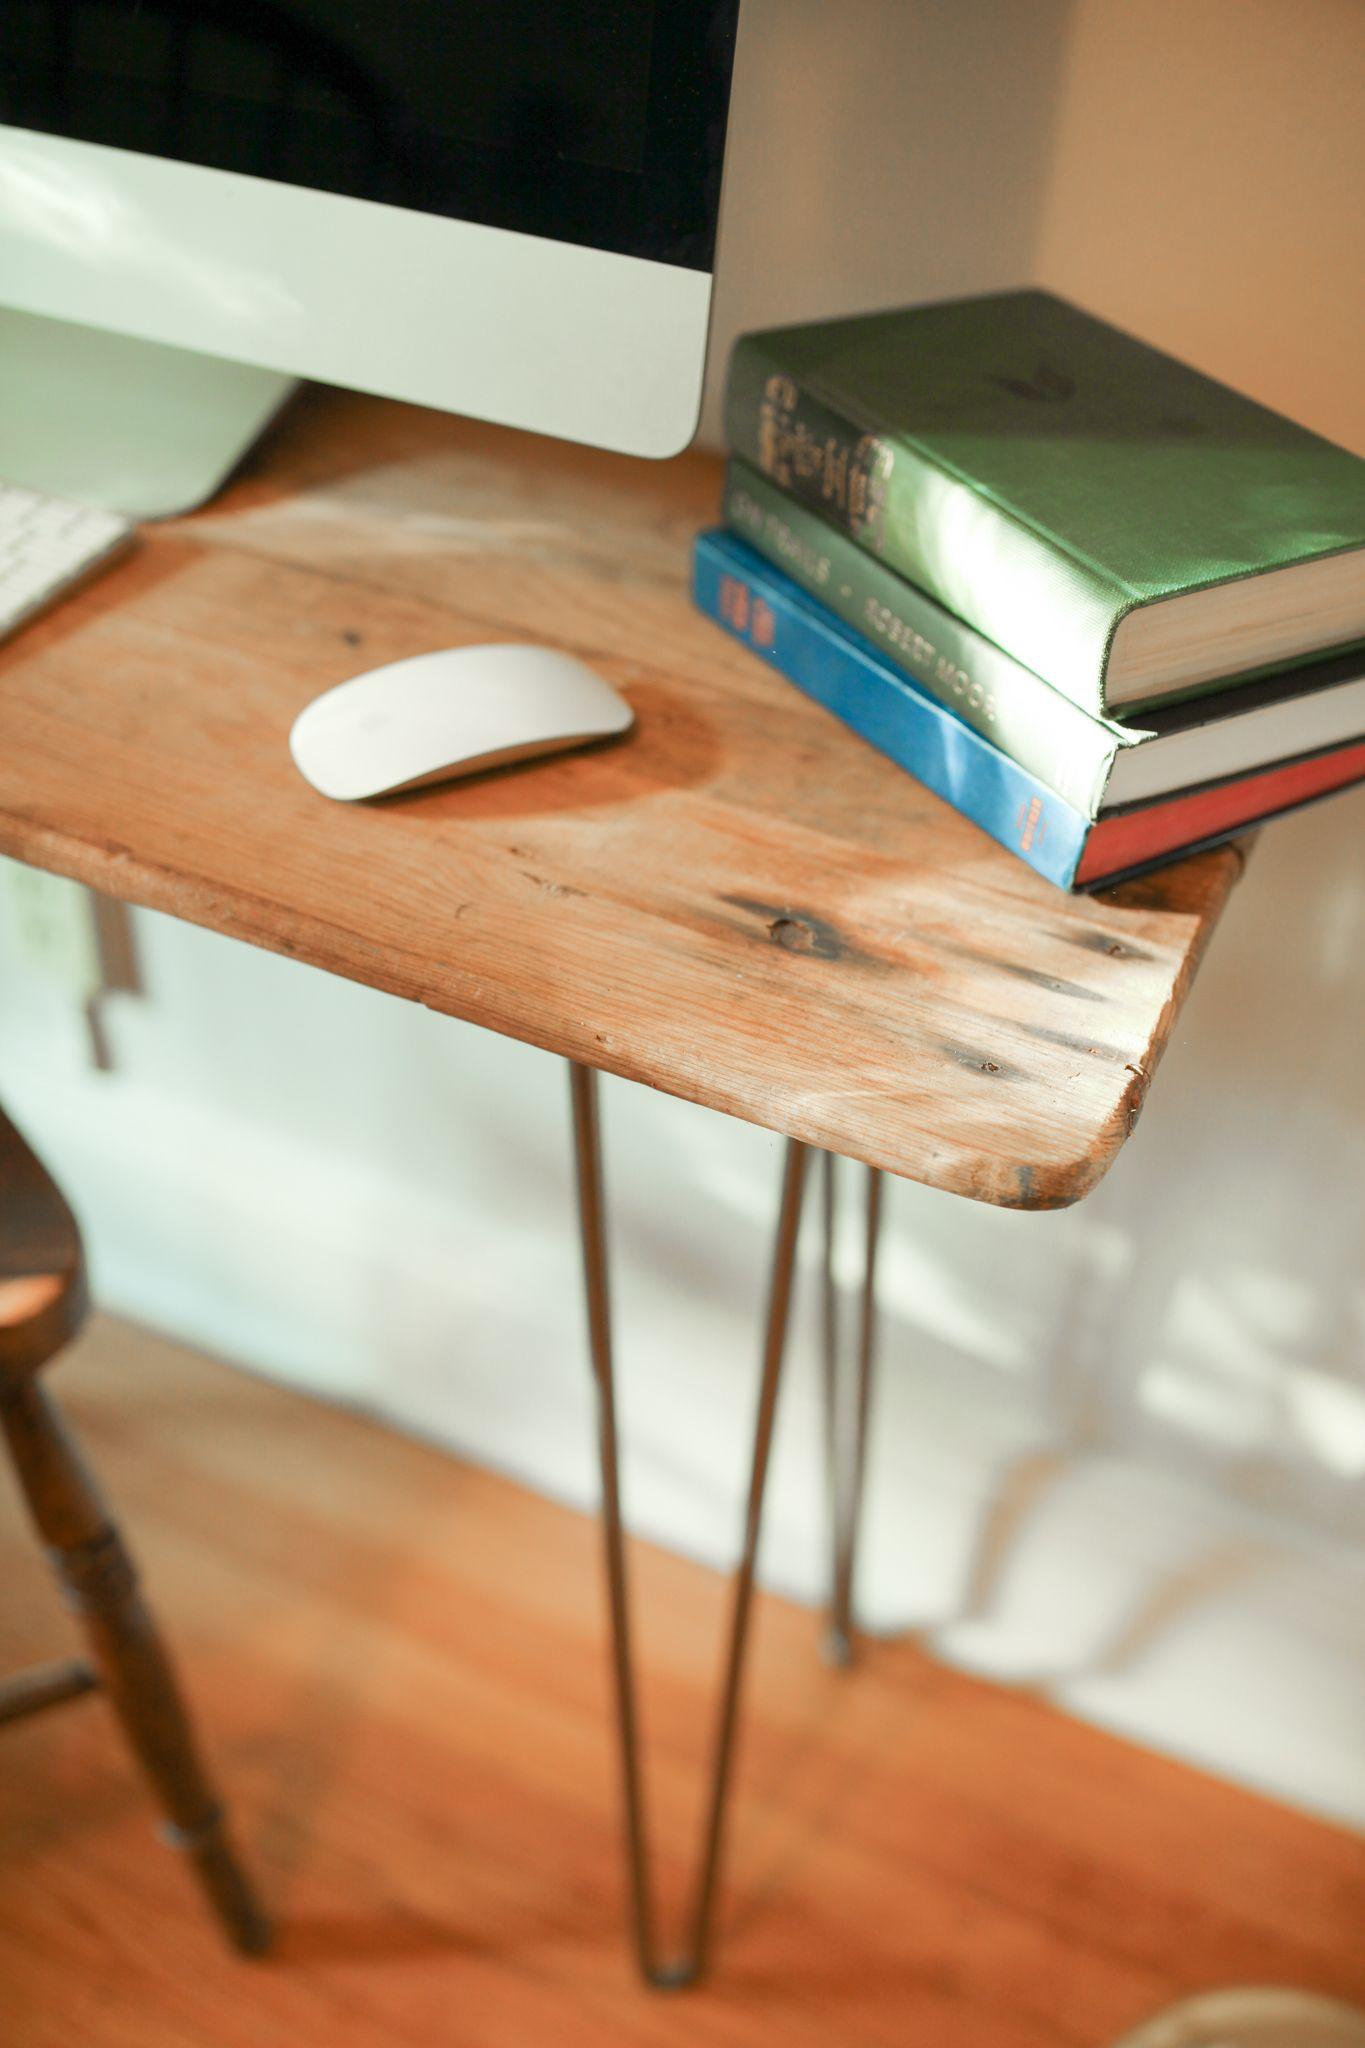 168c17967ffa608b3401391690d7c541 Impressionnant De Table Petit Espace Concept